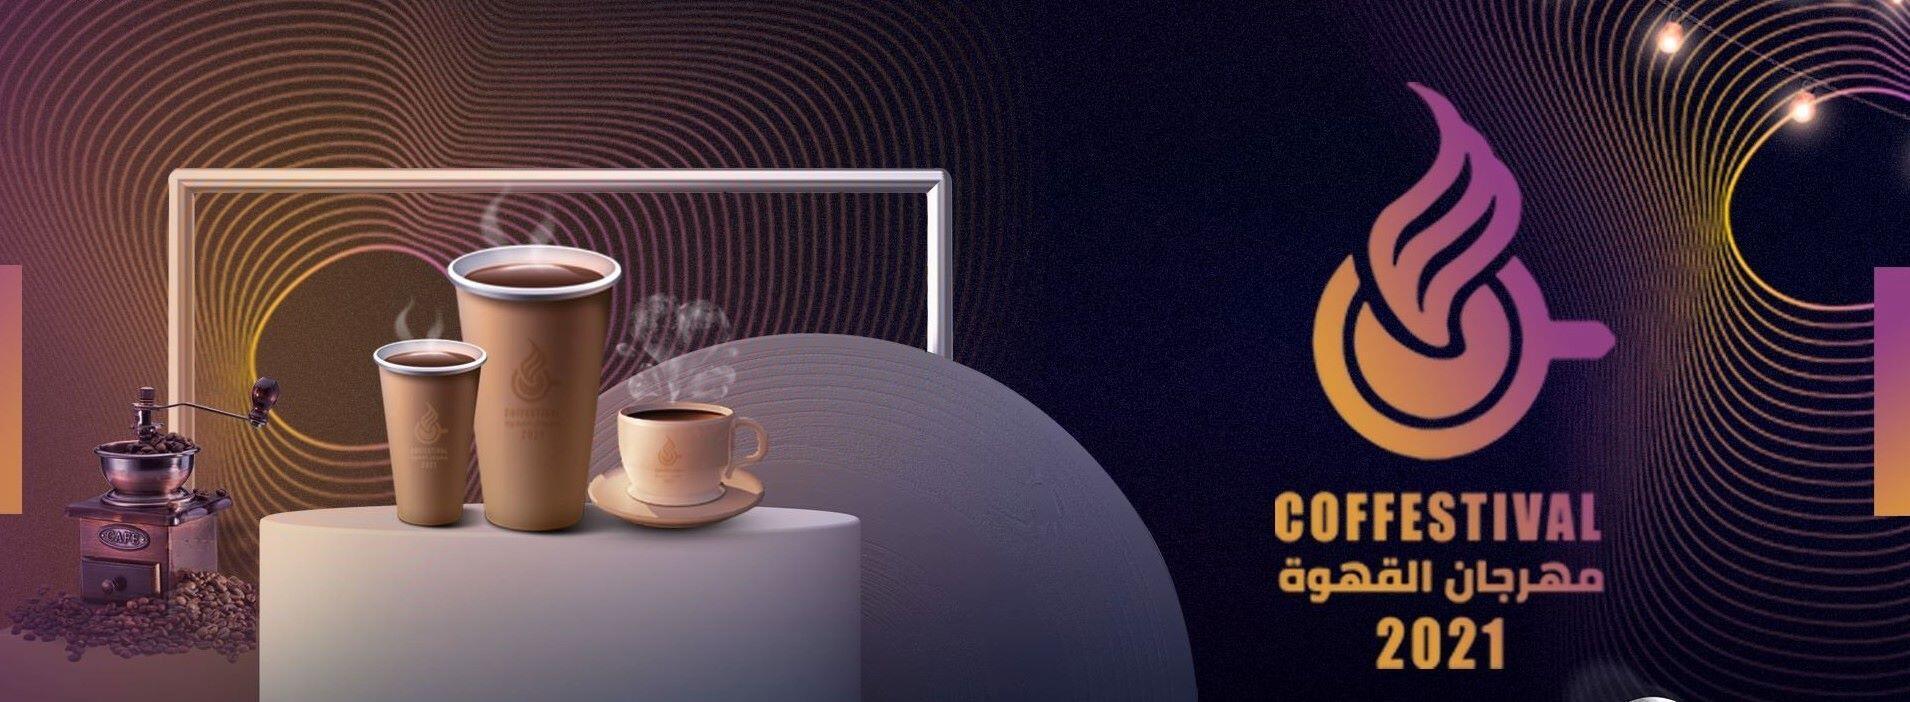 festival_cafe_egypte (3)